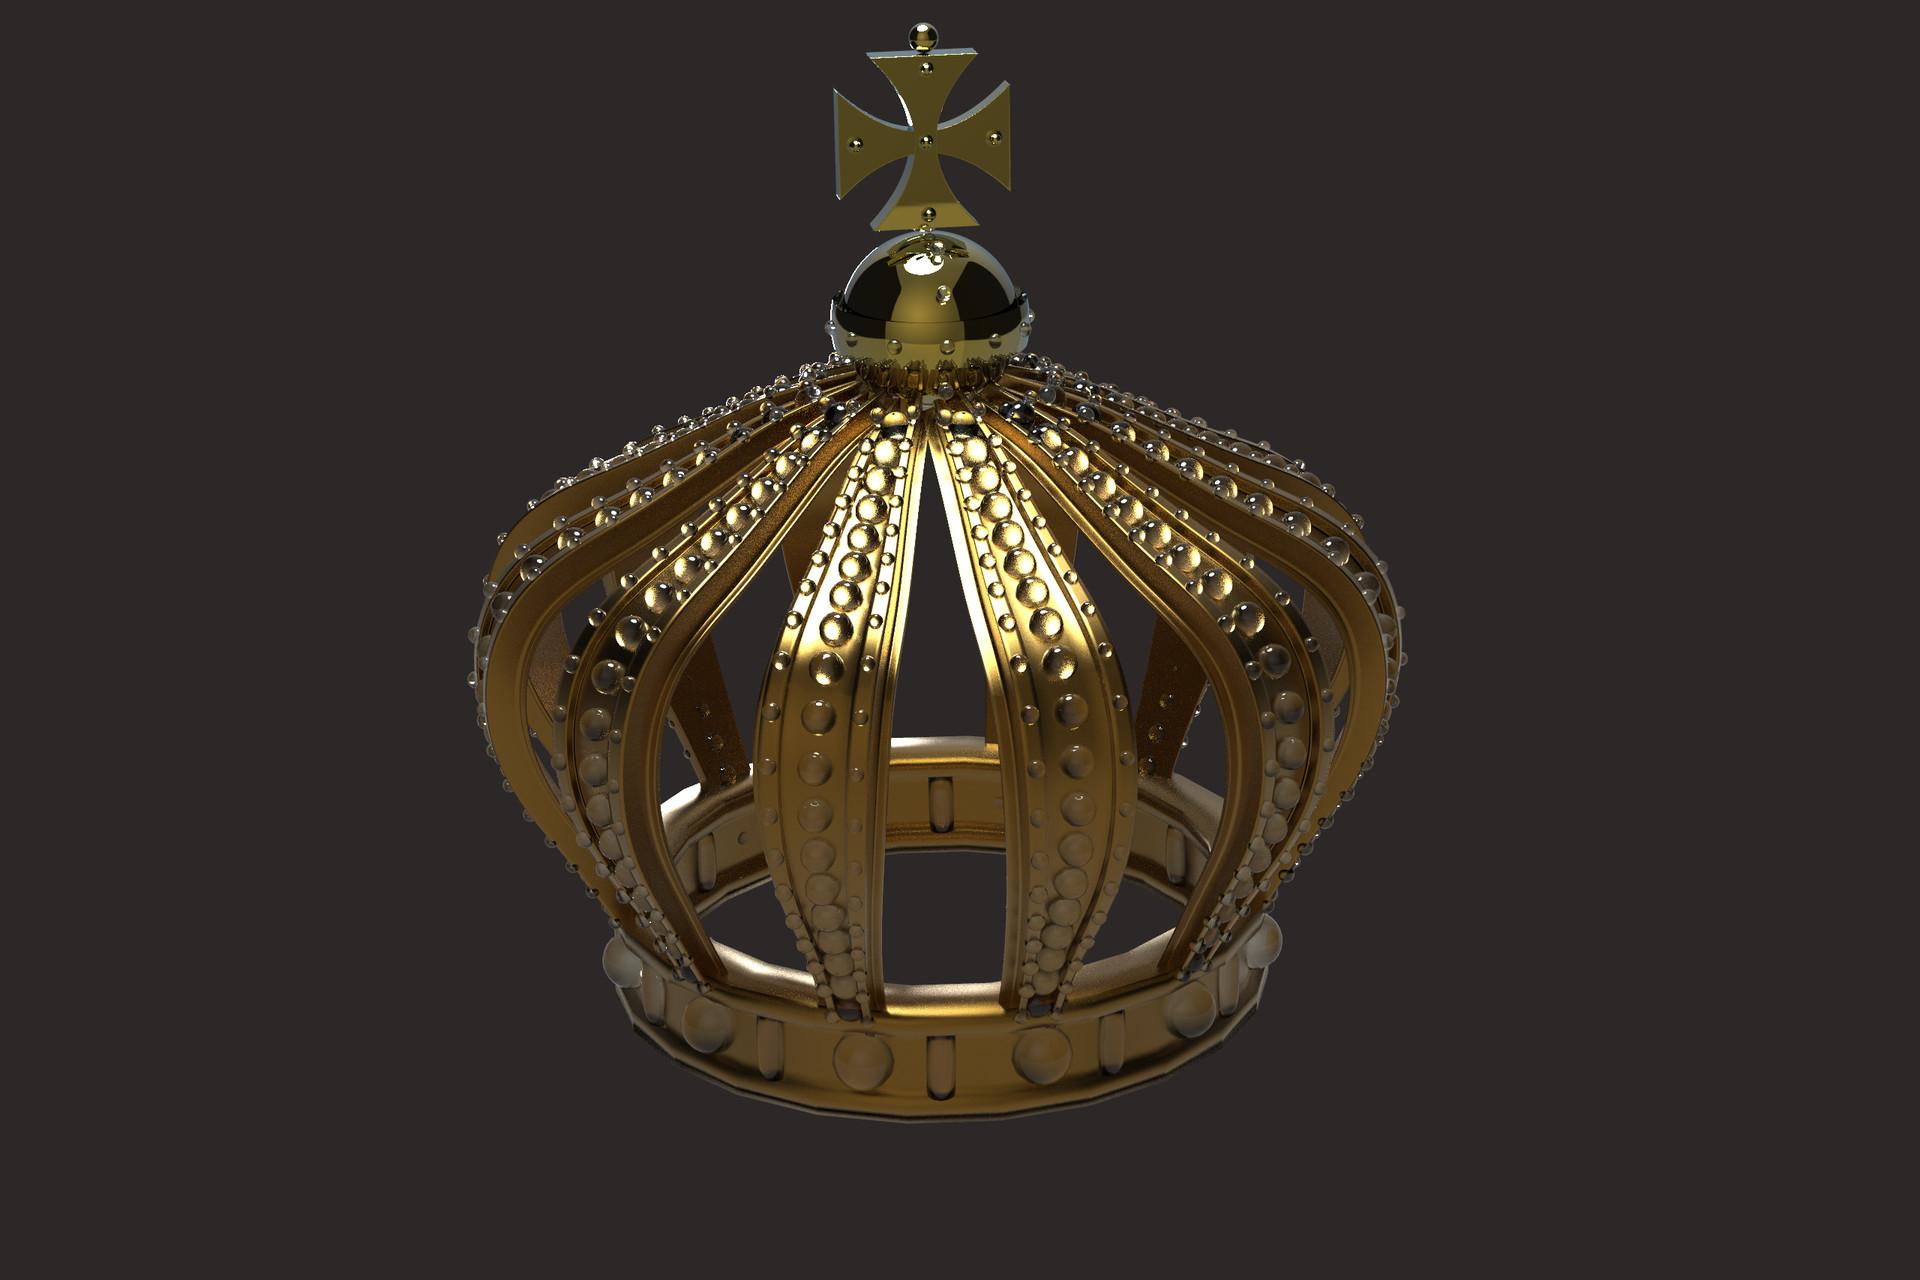 Pierre benjamin crown test render keyhshot 2442726